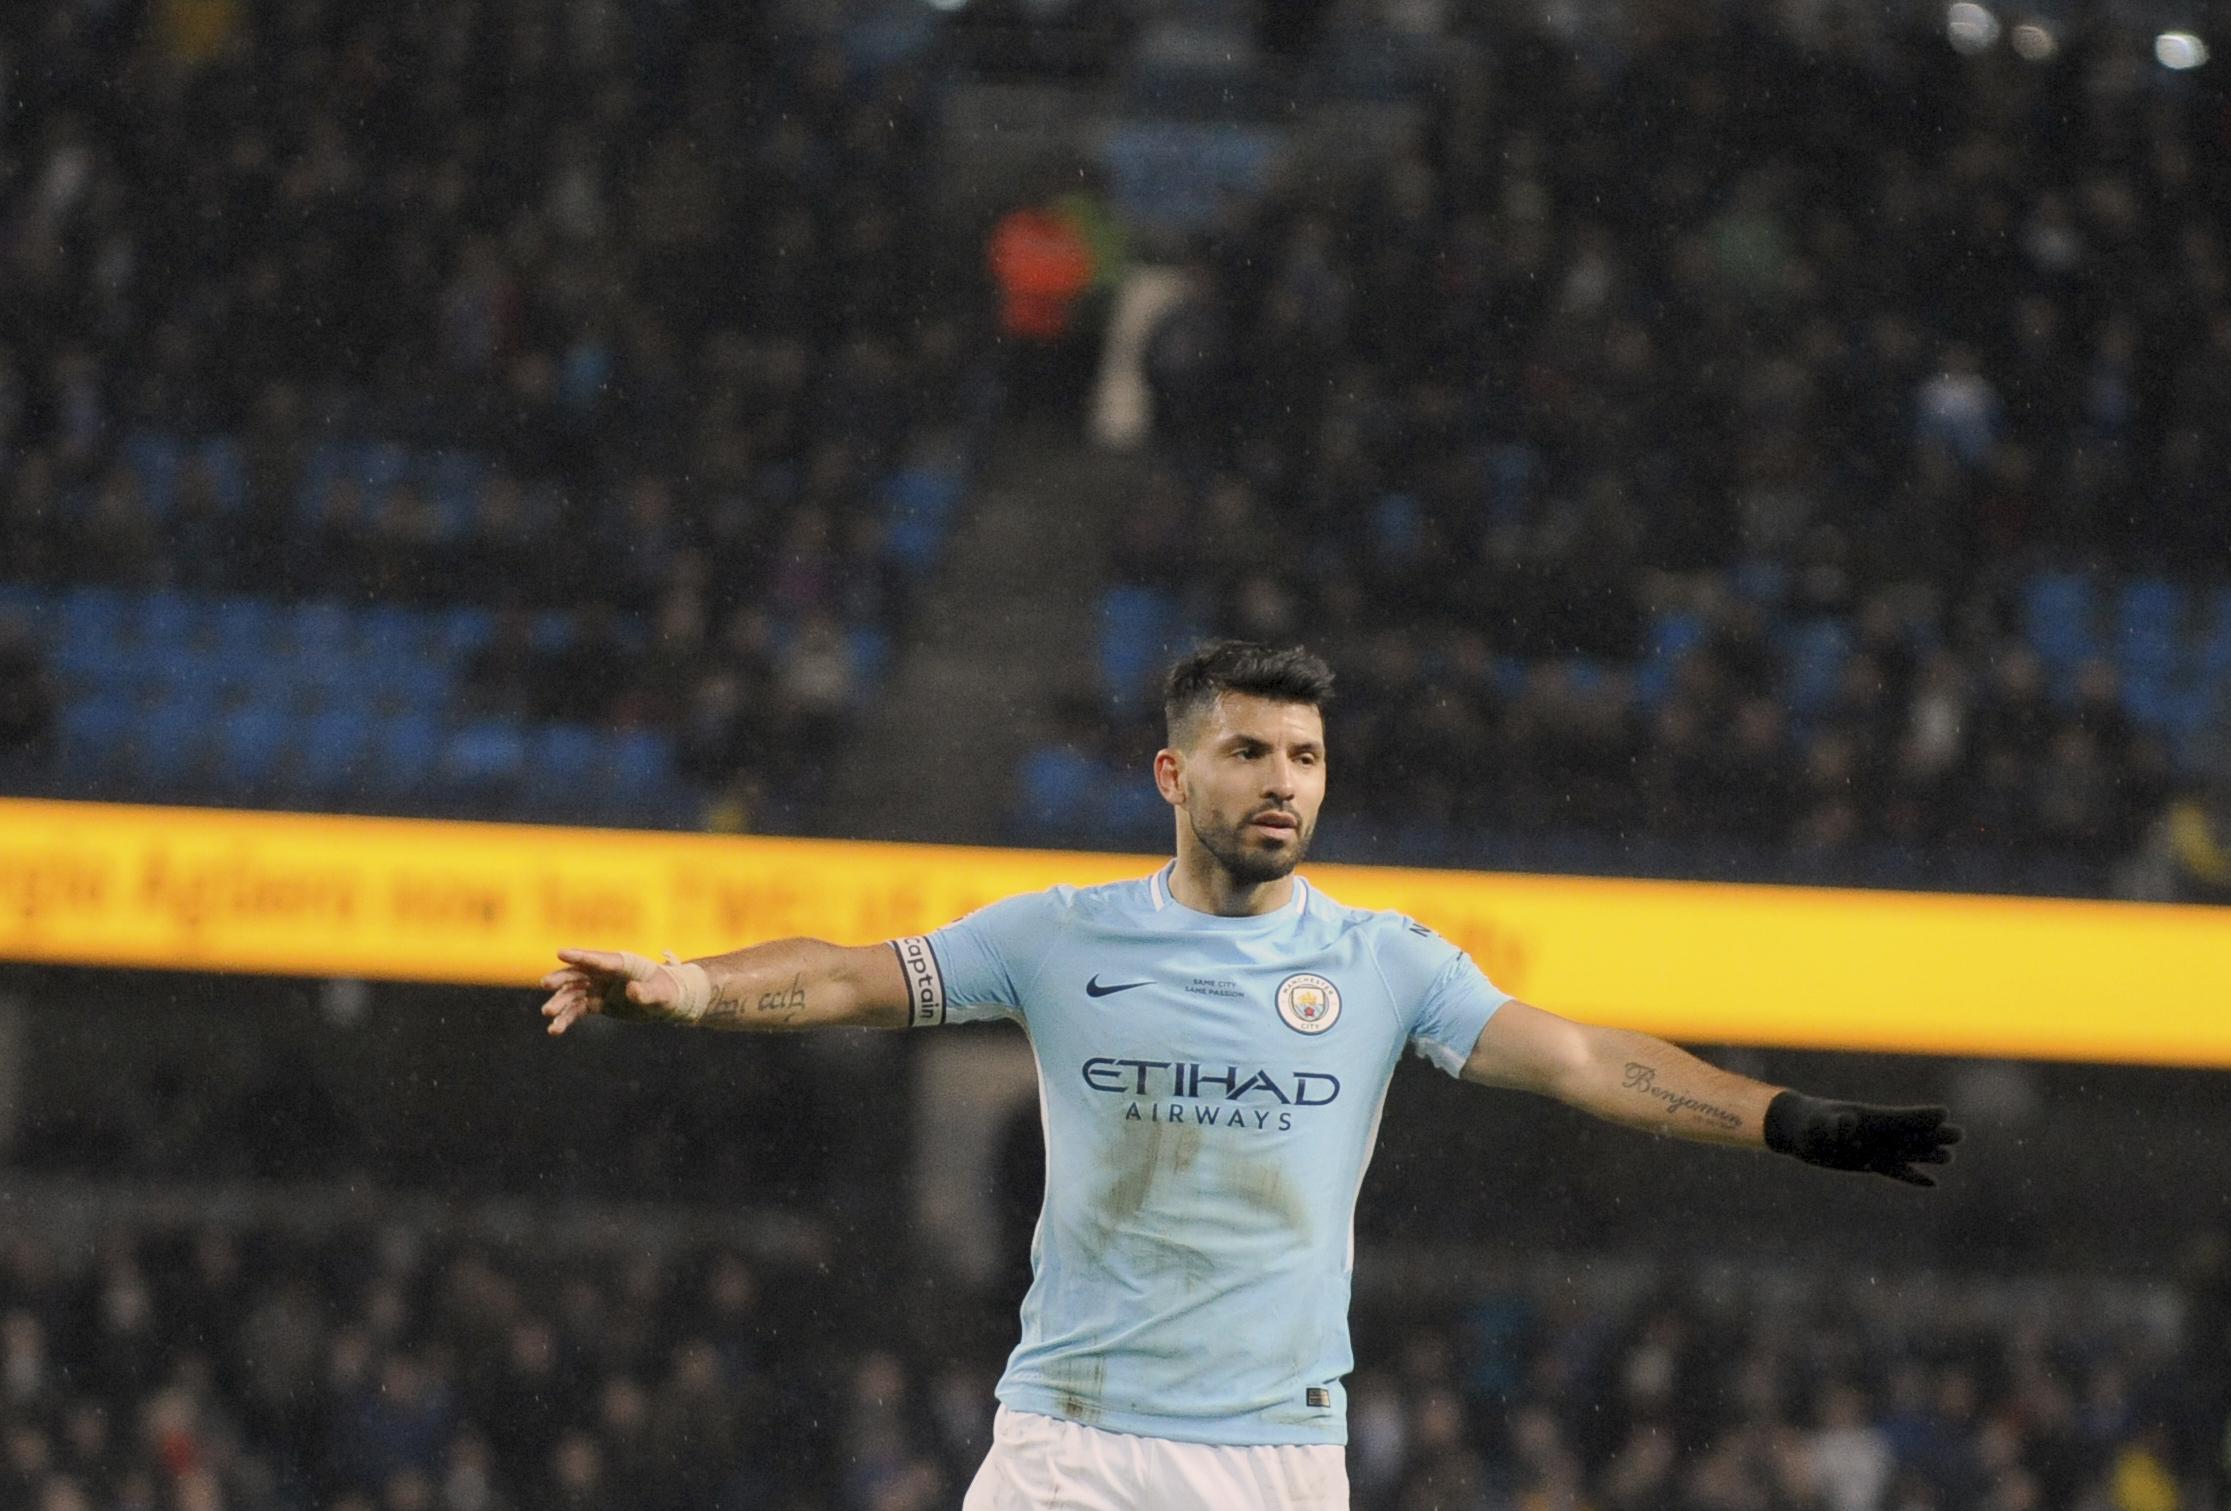 Sergio Aguero攻進單場第4個進球後慶祝。(達志影像)